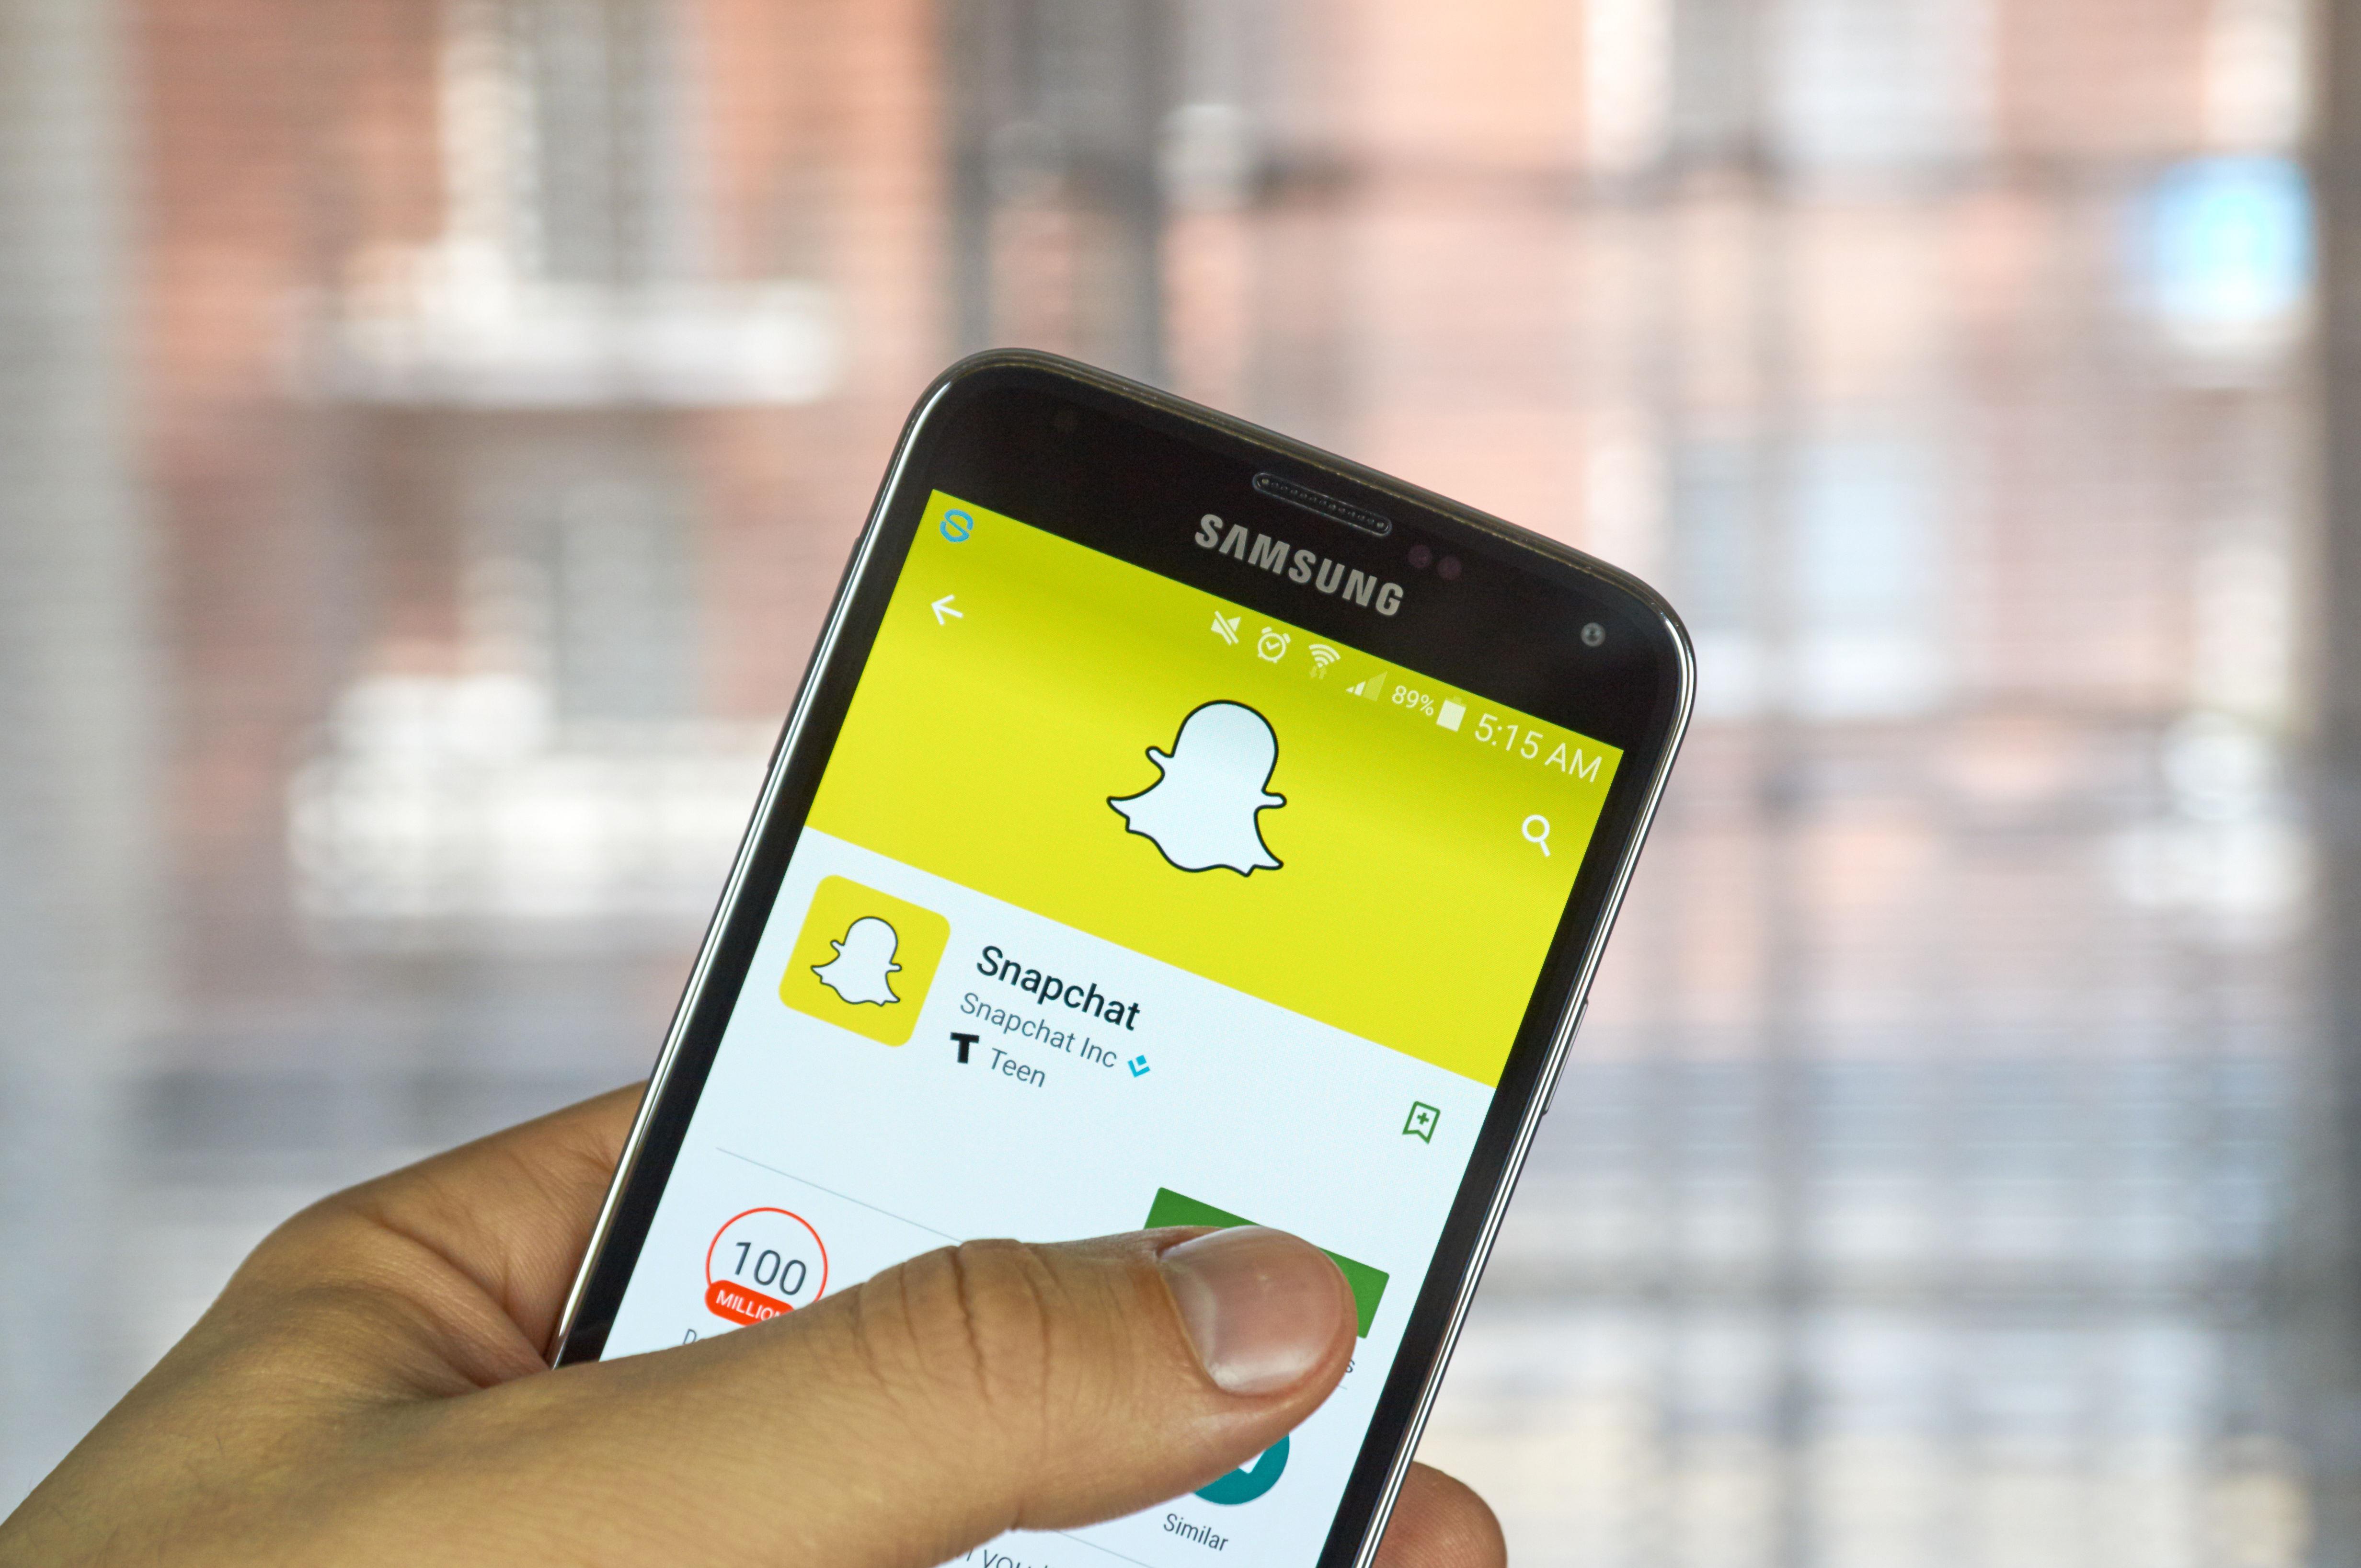 Snapchat on smartphone ()